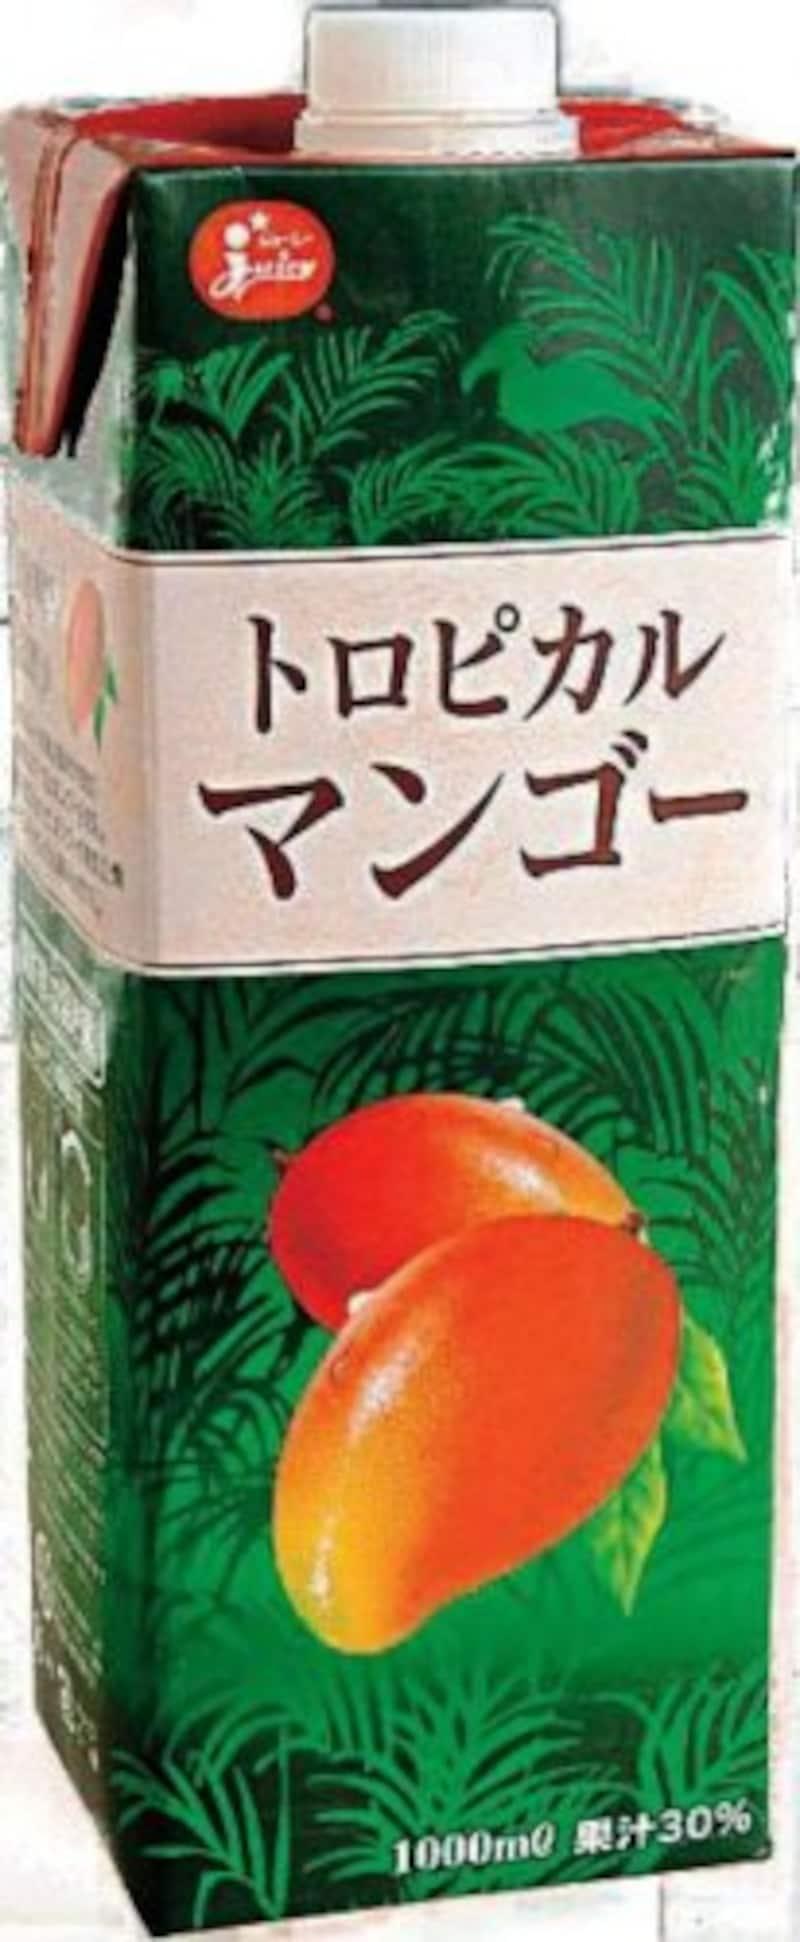 Juicyトロピカルマンゴー